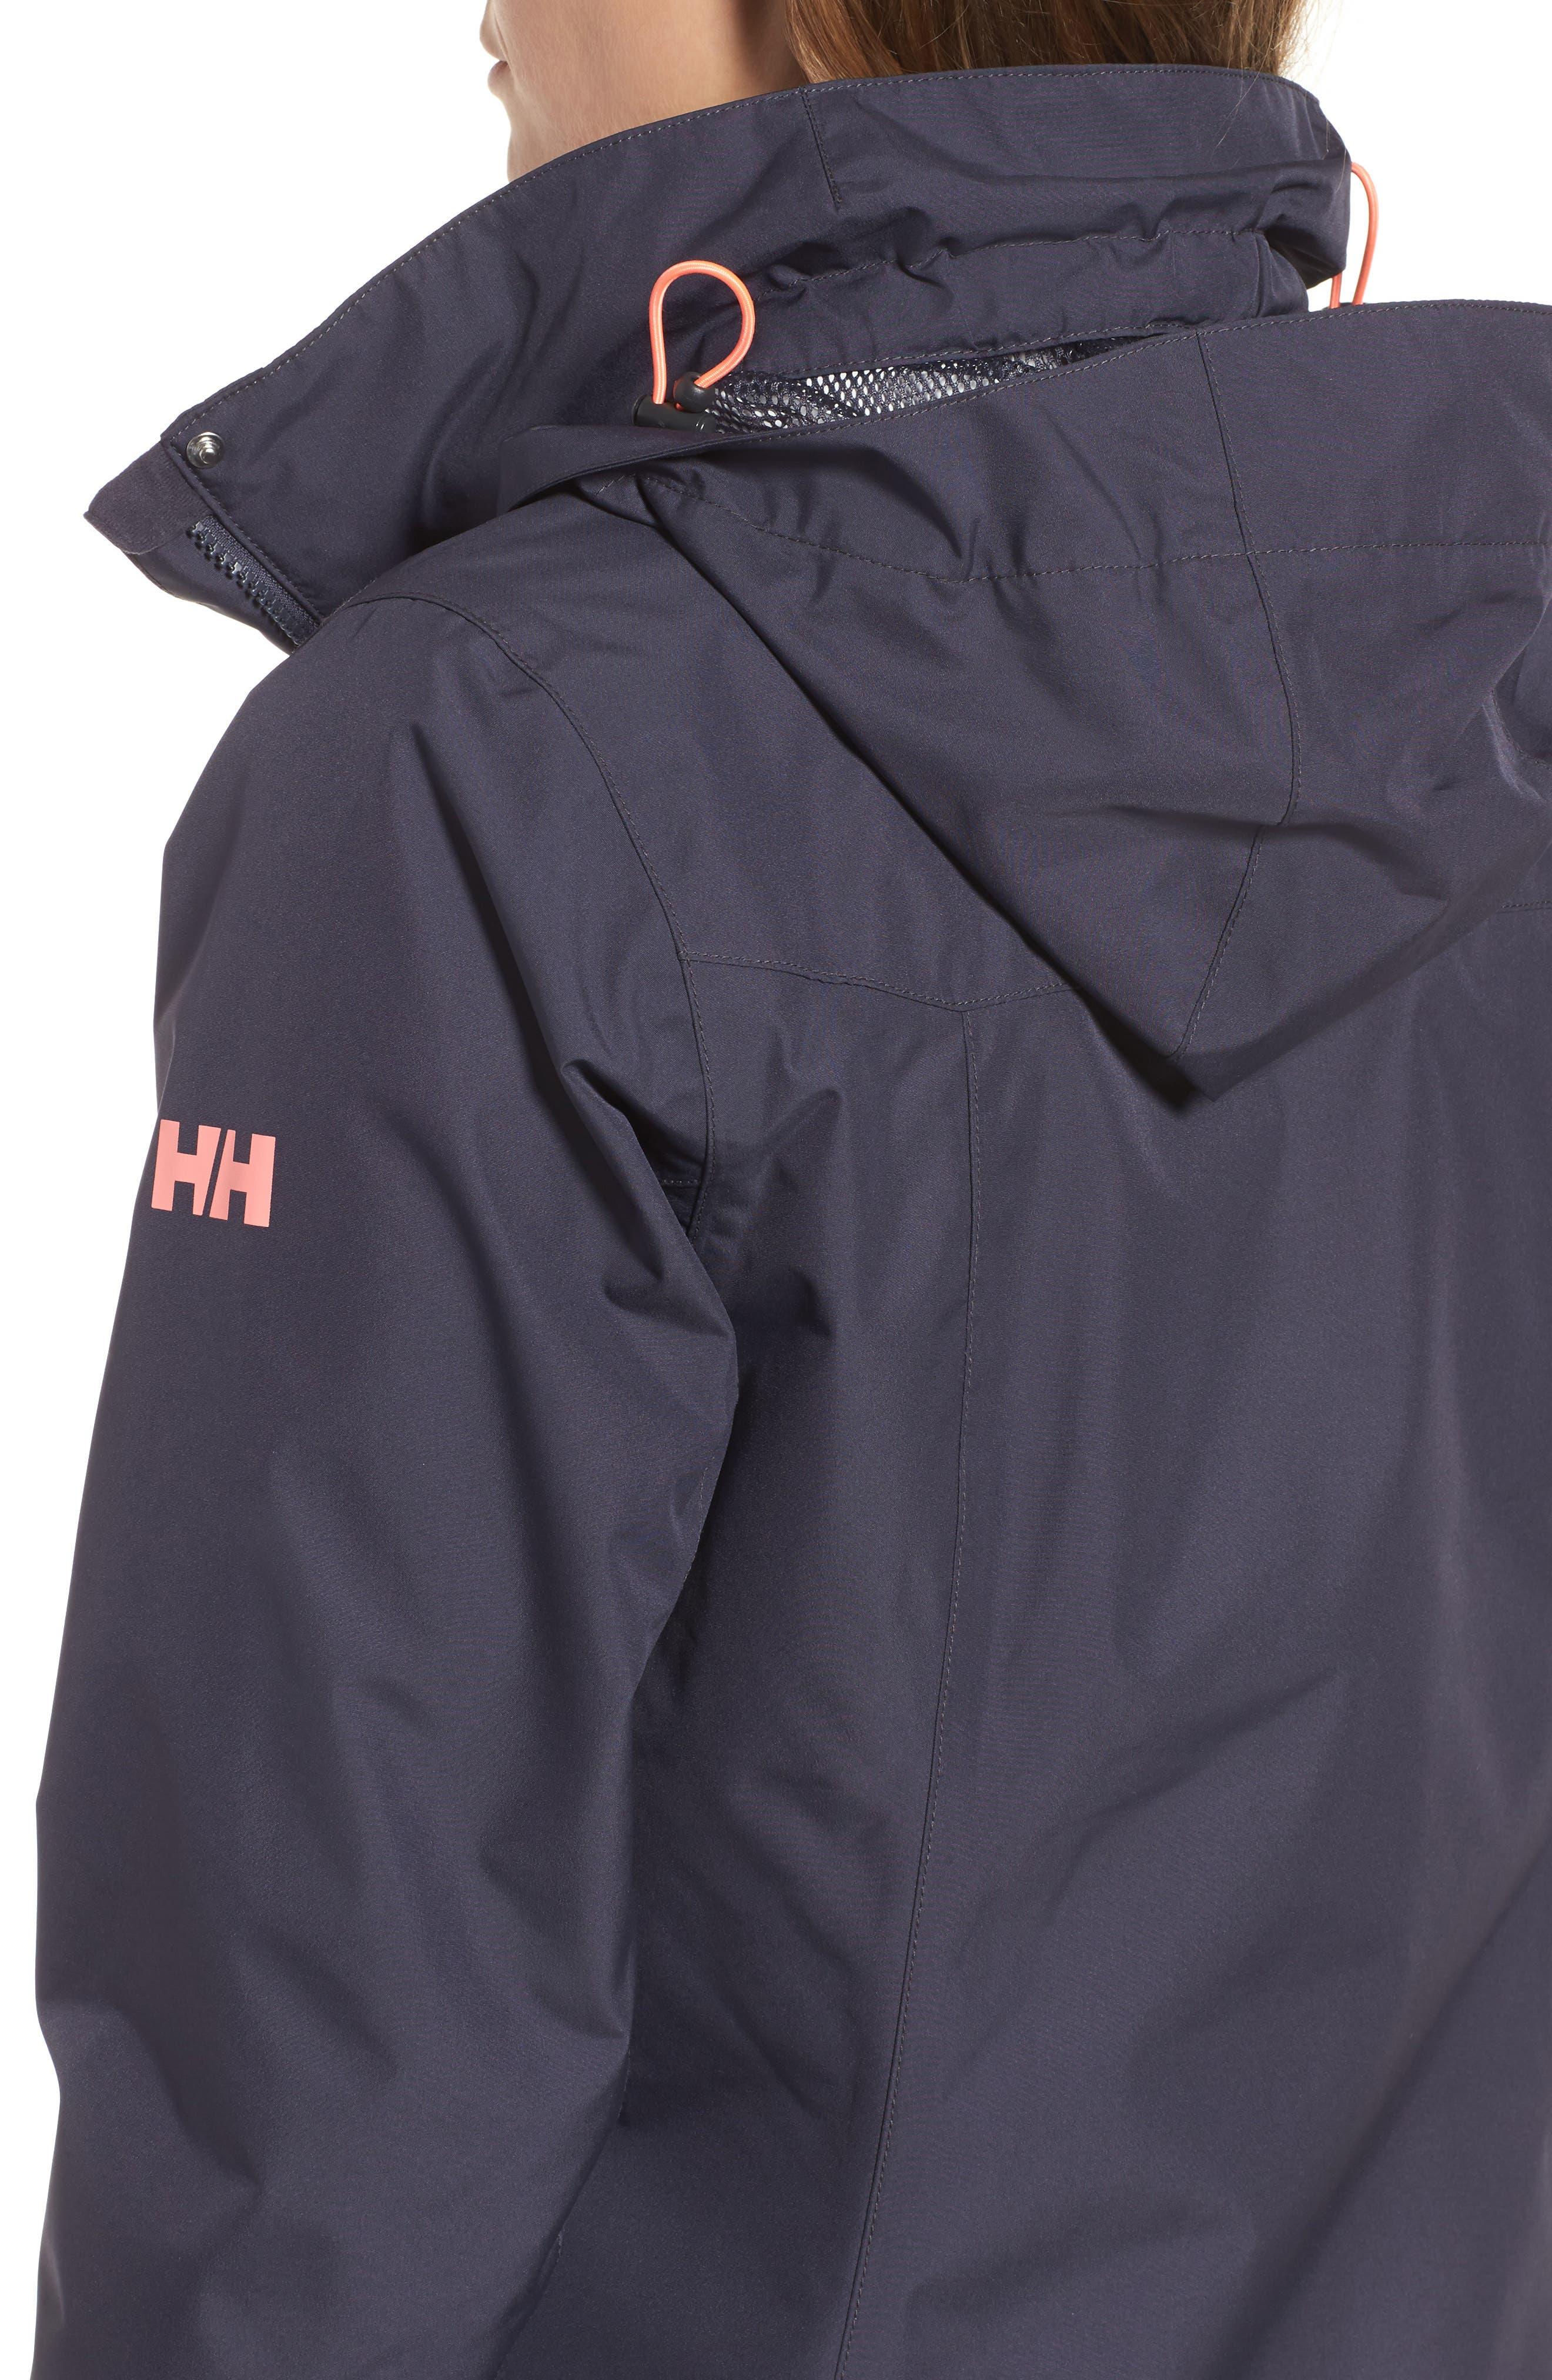 'Aden' Helly Tech<sup>®</sup> Raincoat,                             Alternate thumbnail 4, color,                             Graphite Blue